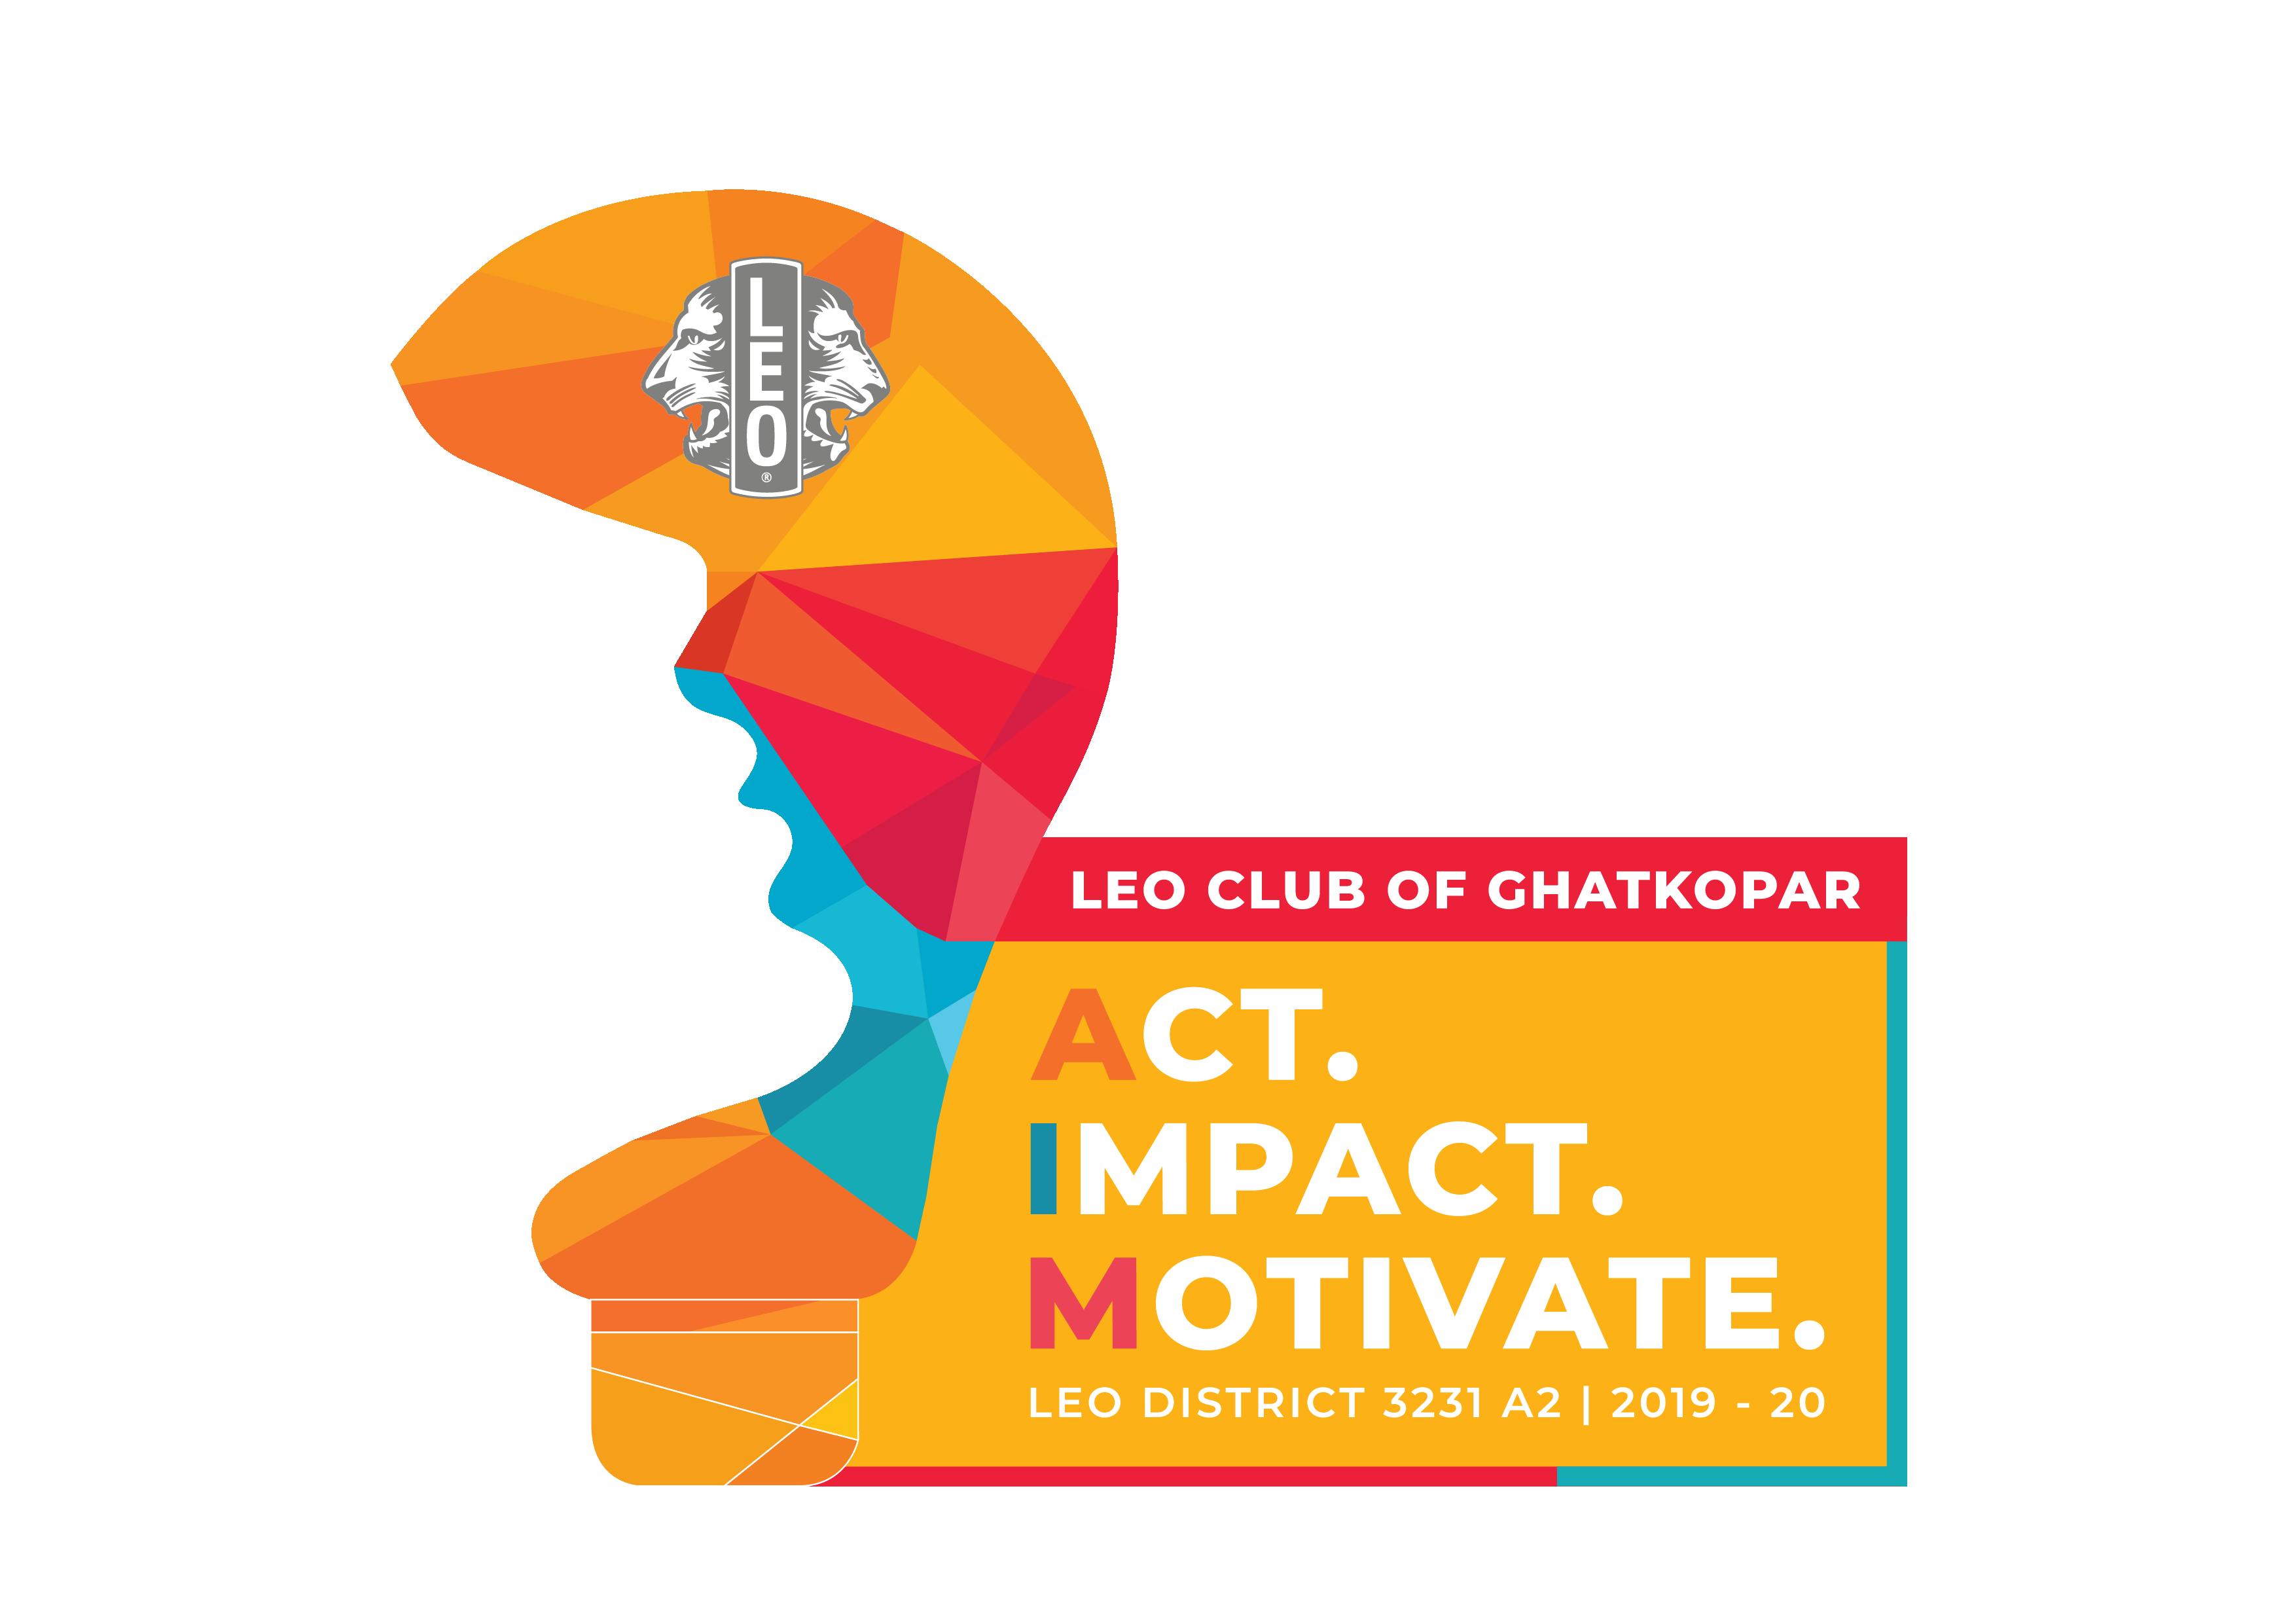 Leo Club of Ghatkoper